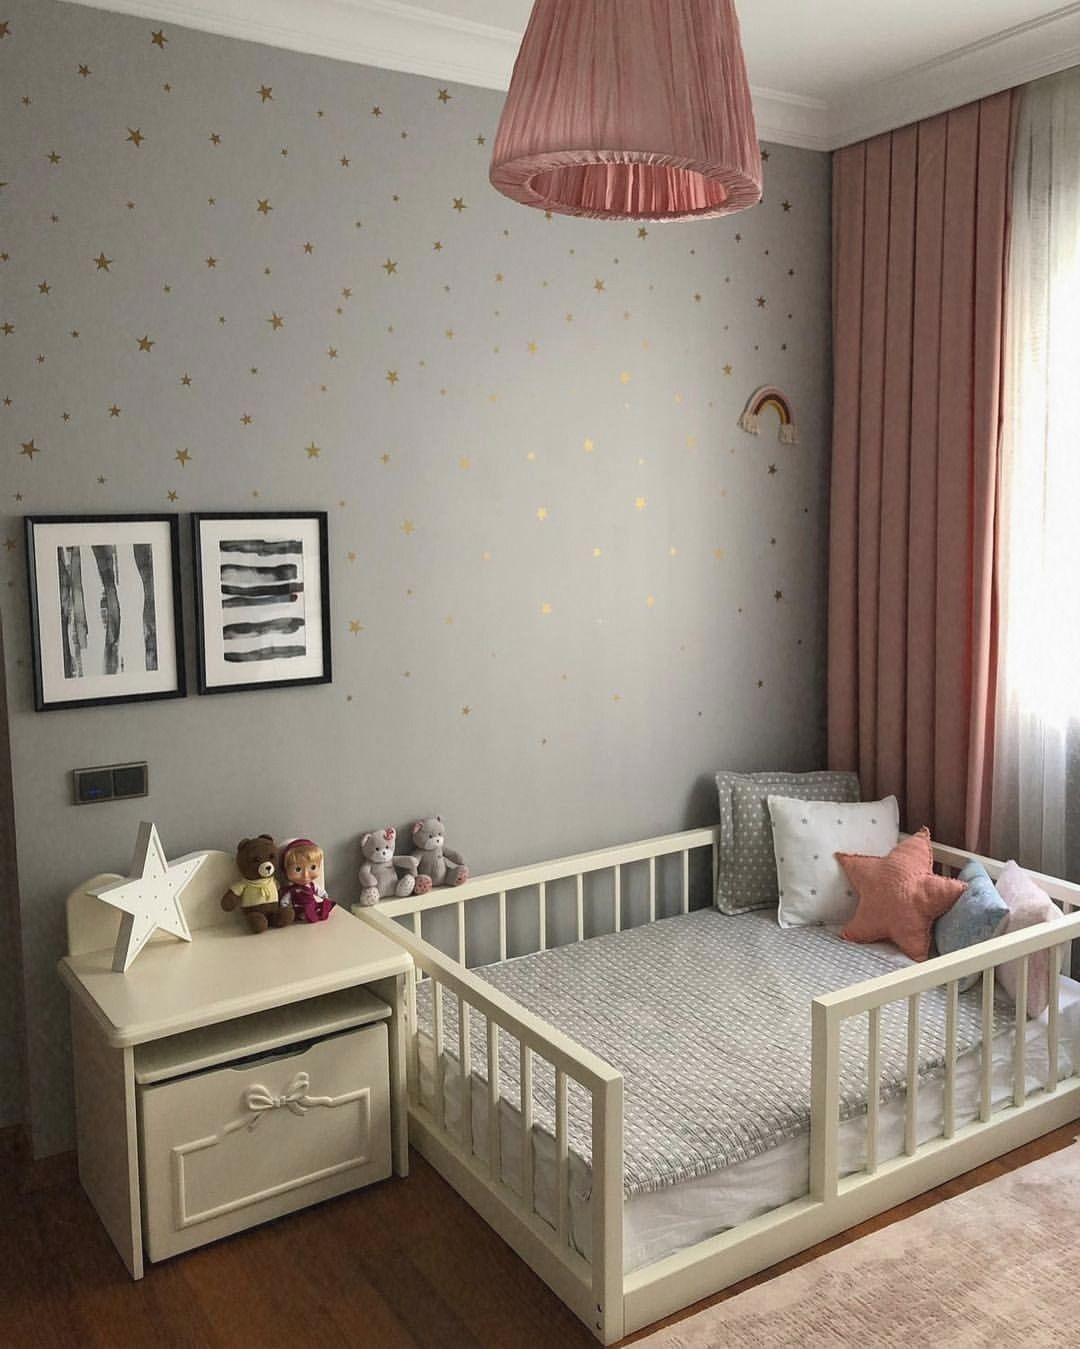 30+ Stylish & Chic Kids Room Decorating Ideas – for Girls & Boys – pickndecor.com/furniture